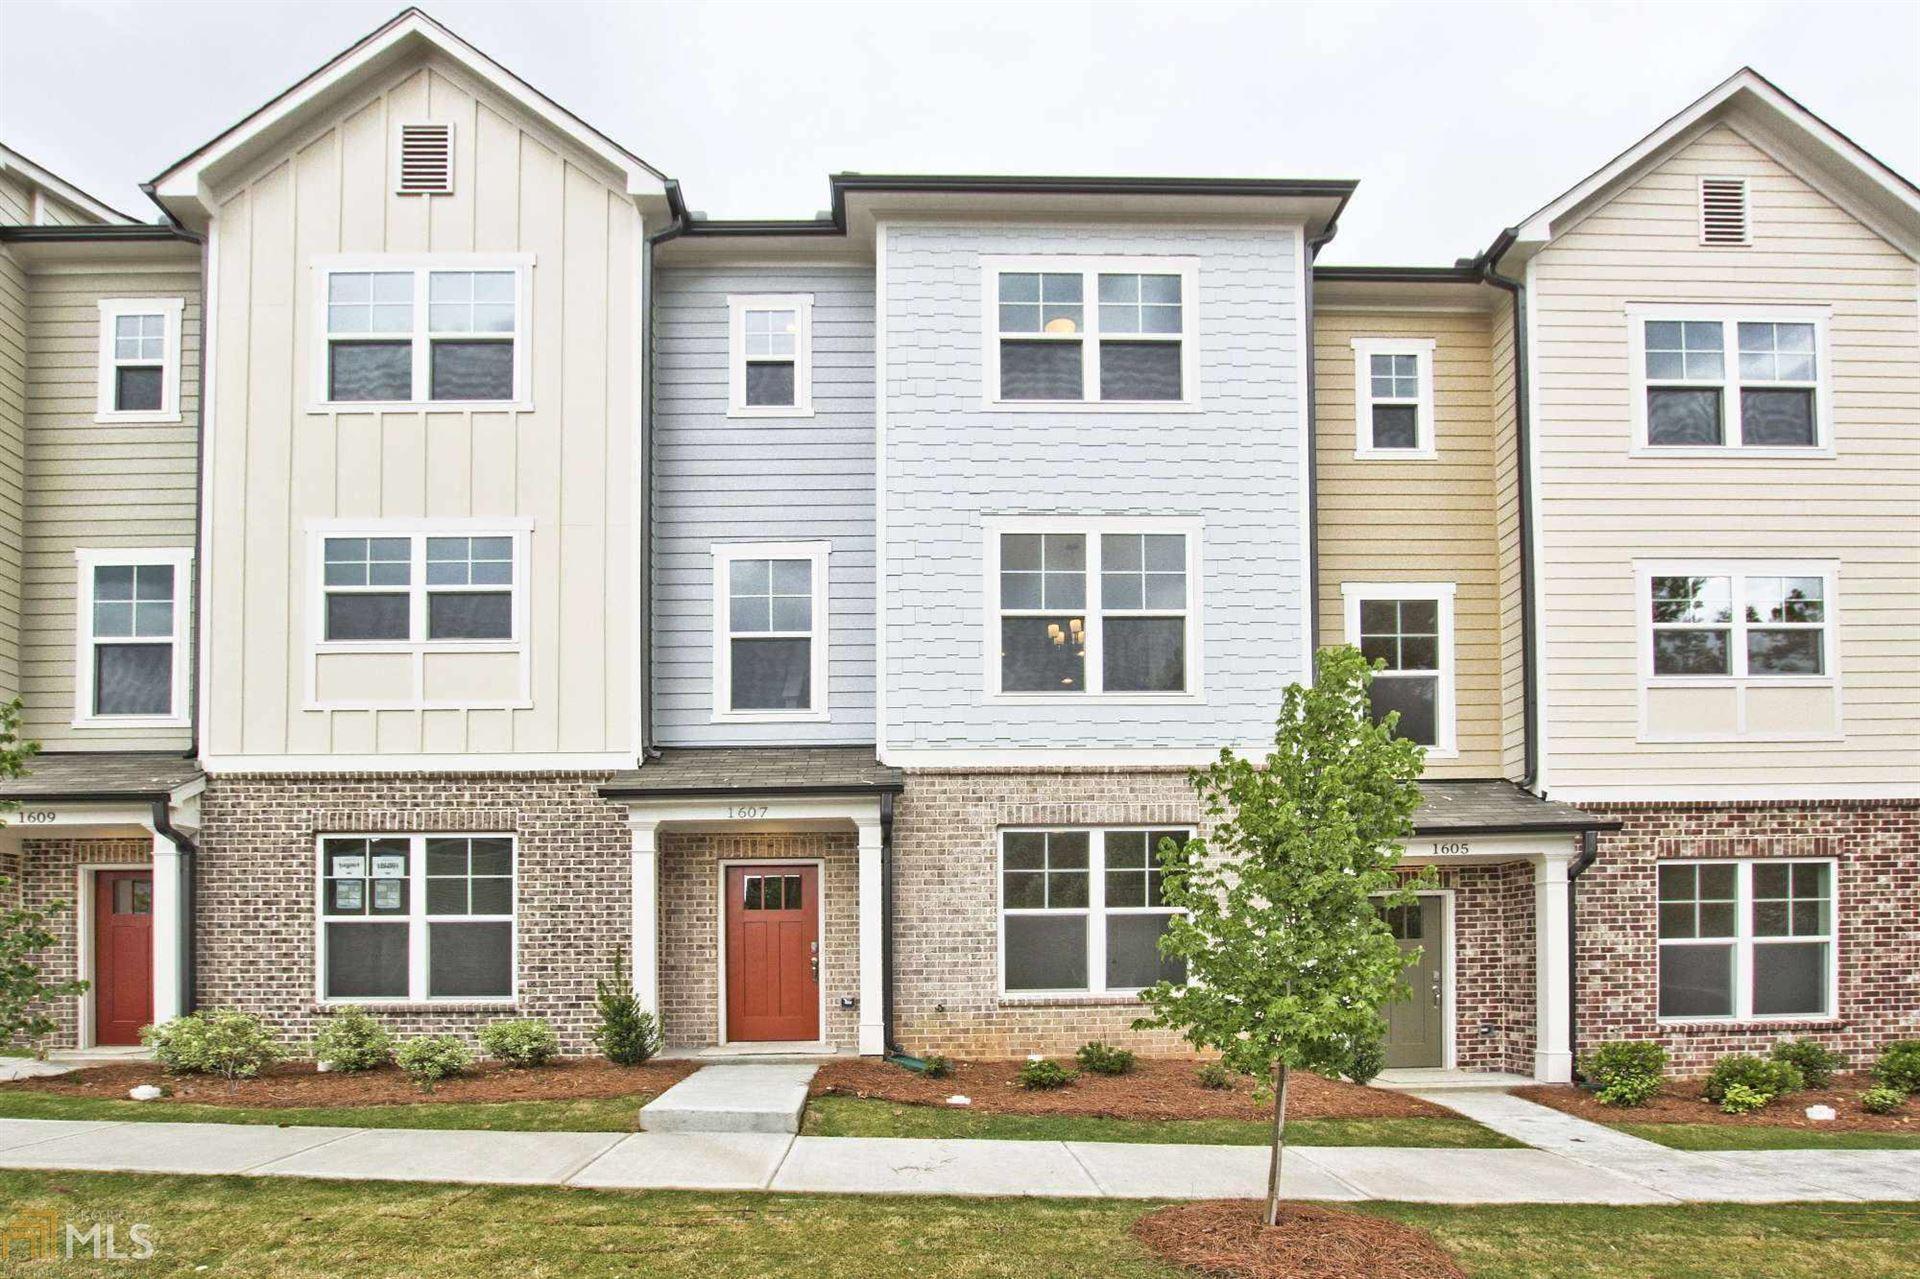 1634 Venture Point Way, Decatur, GA 30032 - MLS#: 8812186